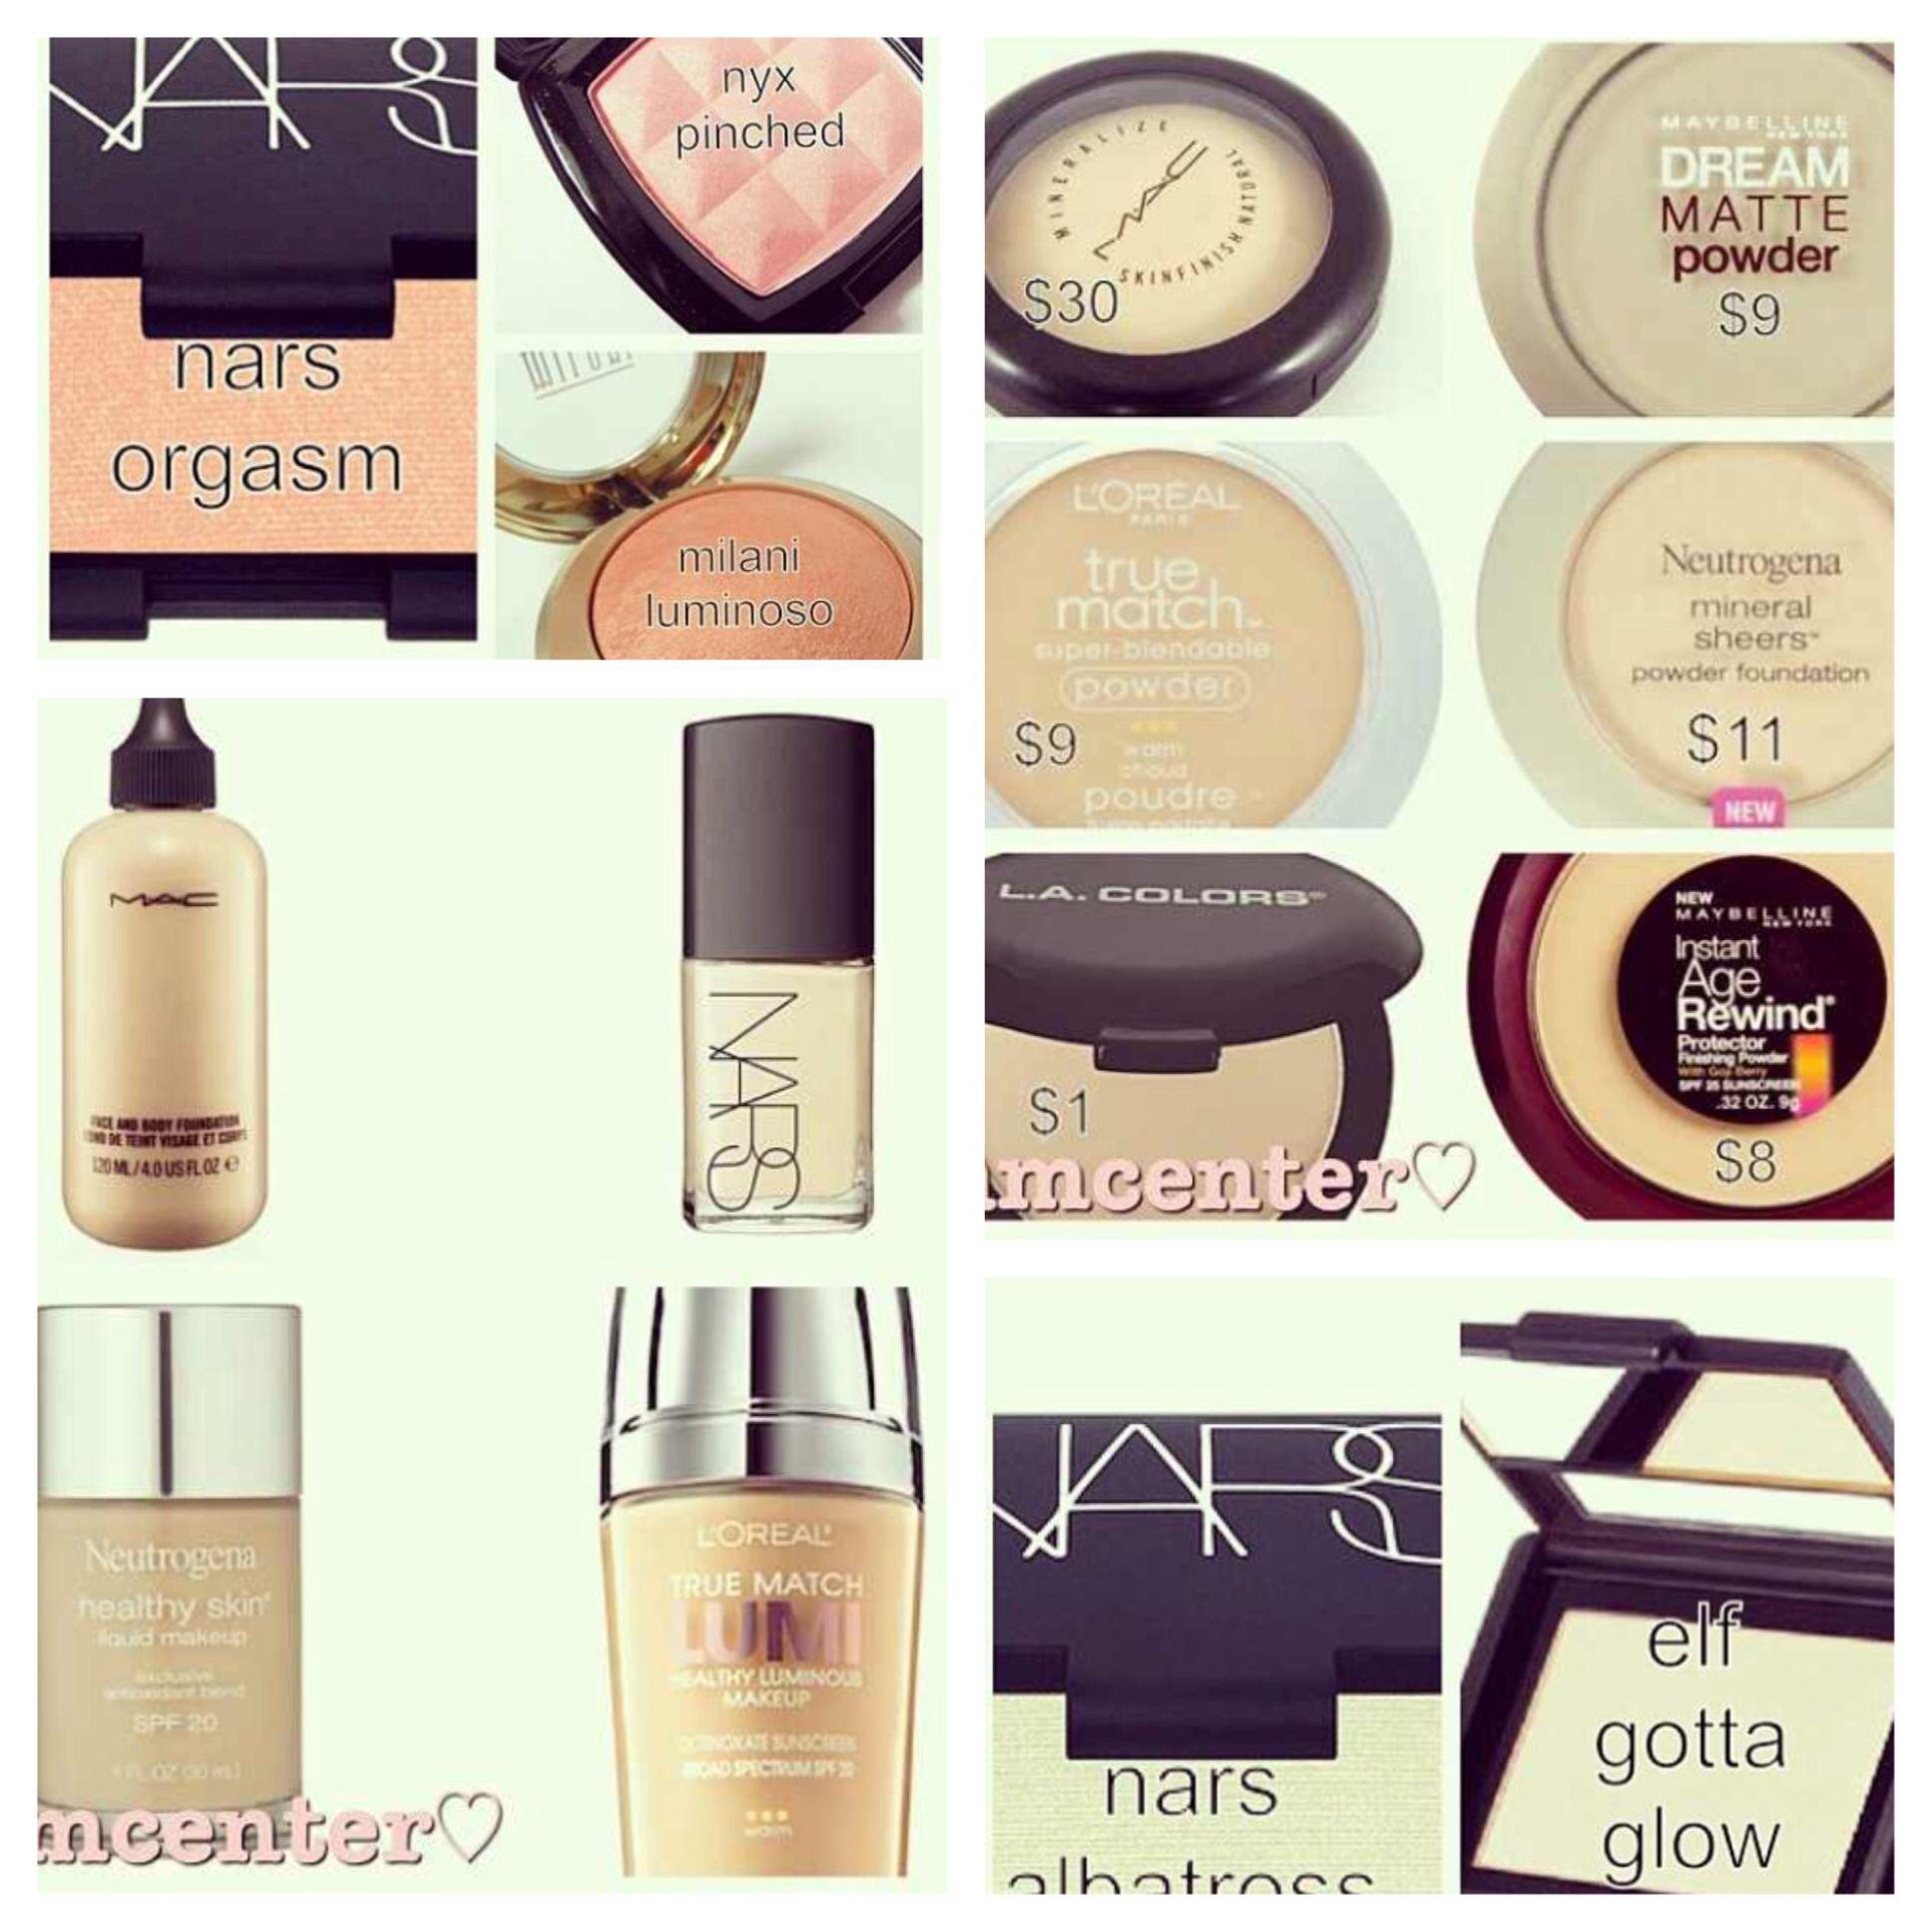 Best Drugstore Makeup Dupes - The Ultimate List - liana desu